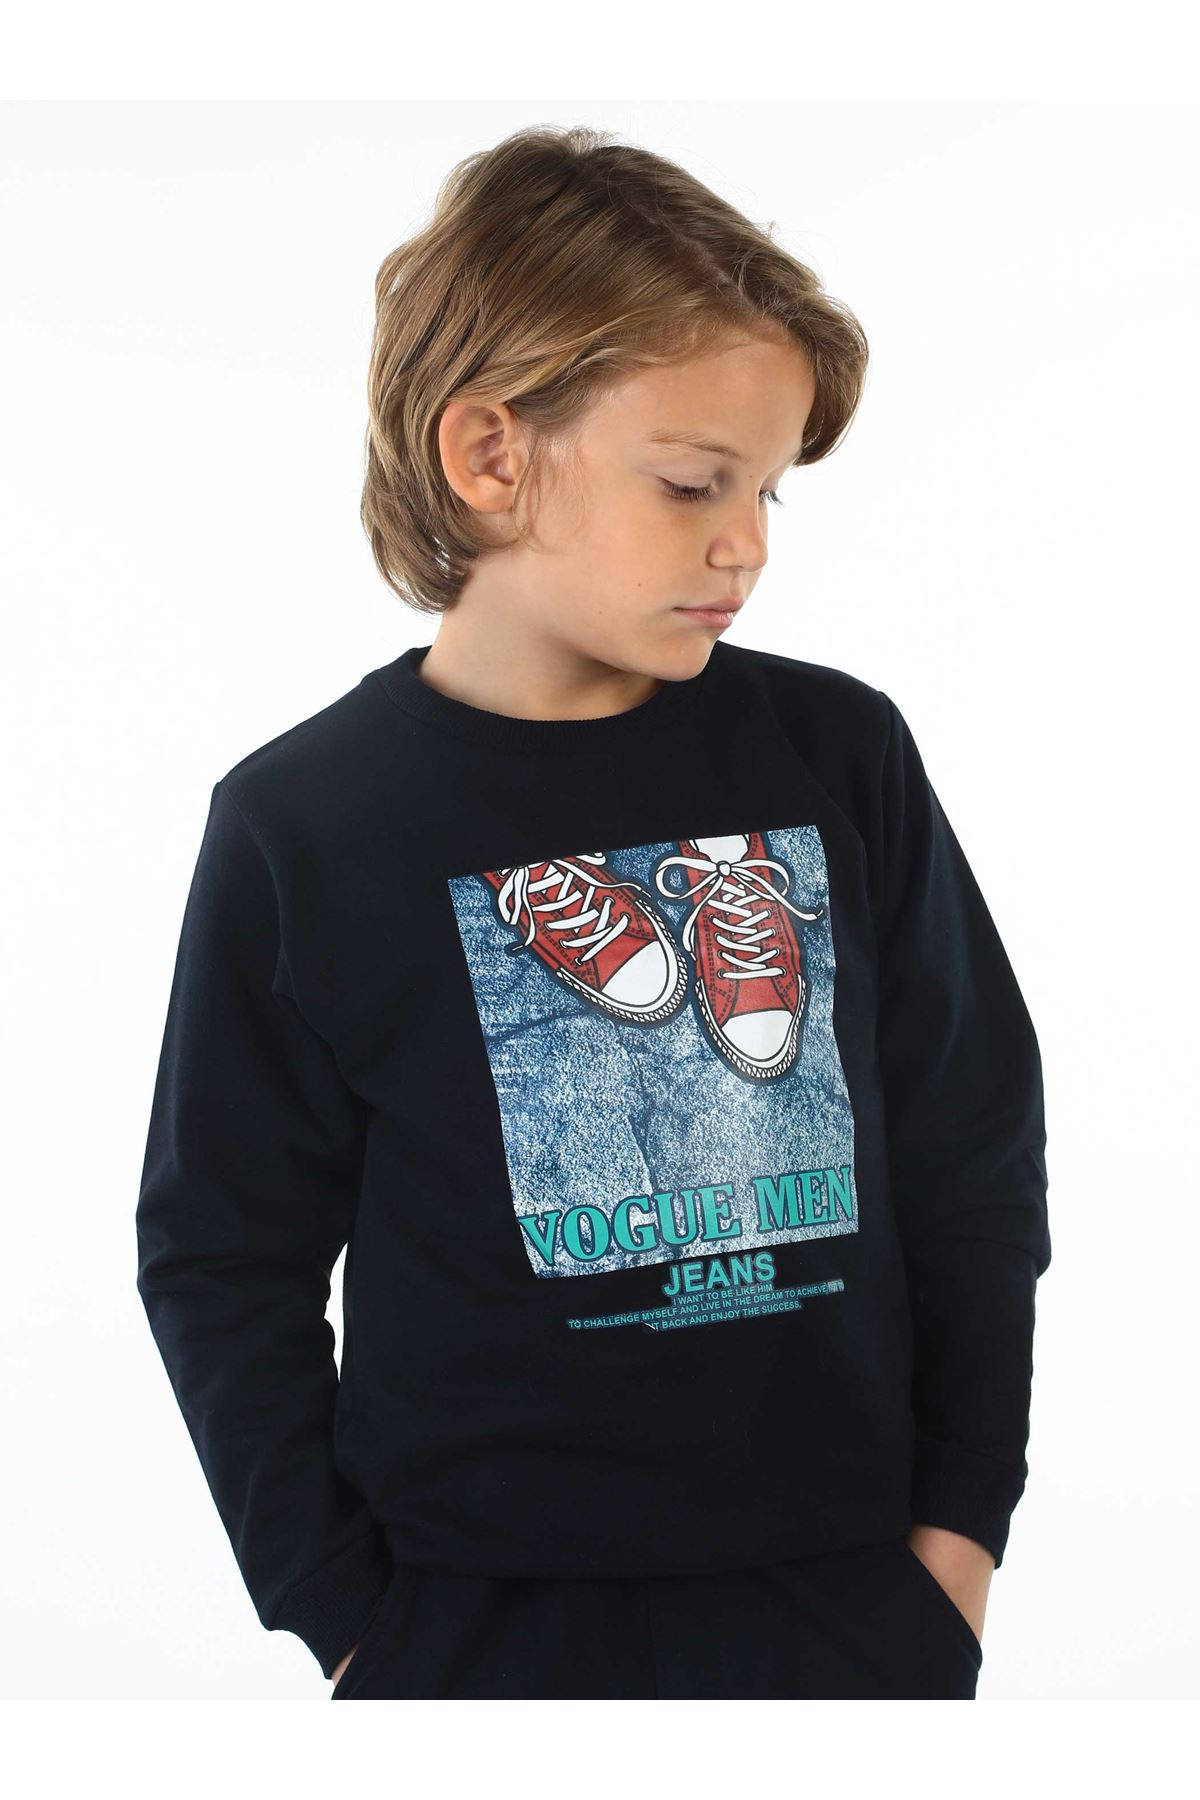 Navy Blue Seasonal Male Child Sweatshirt